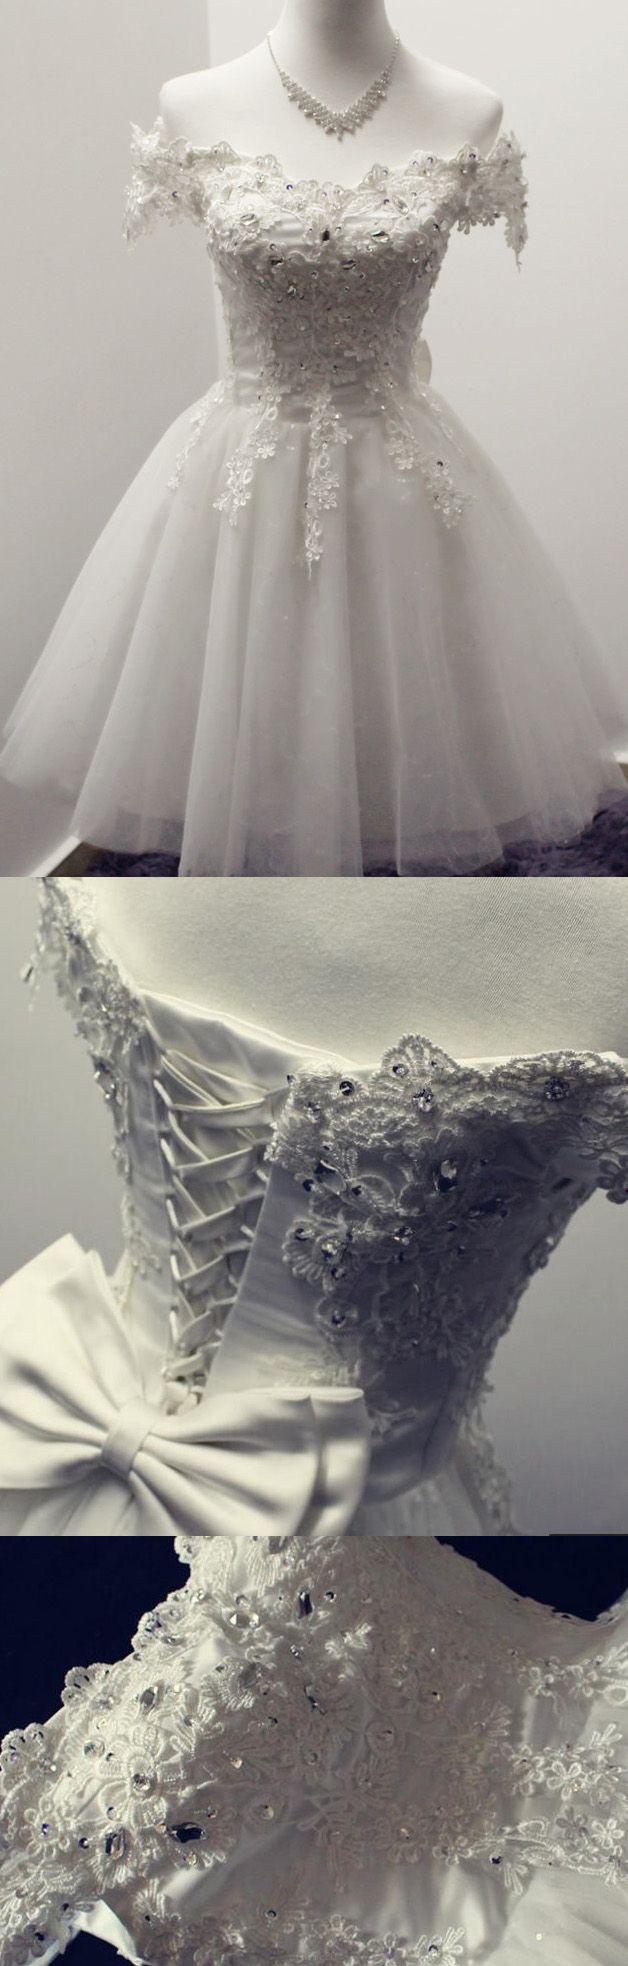 Short prom dresses lace prom dresses prom dresses short princess